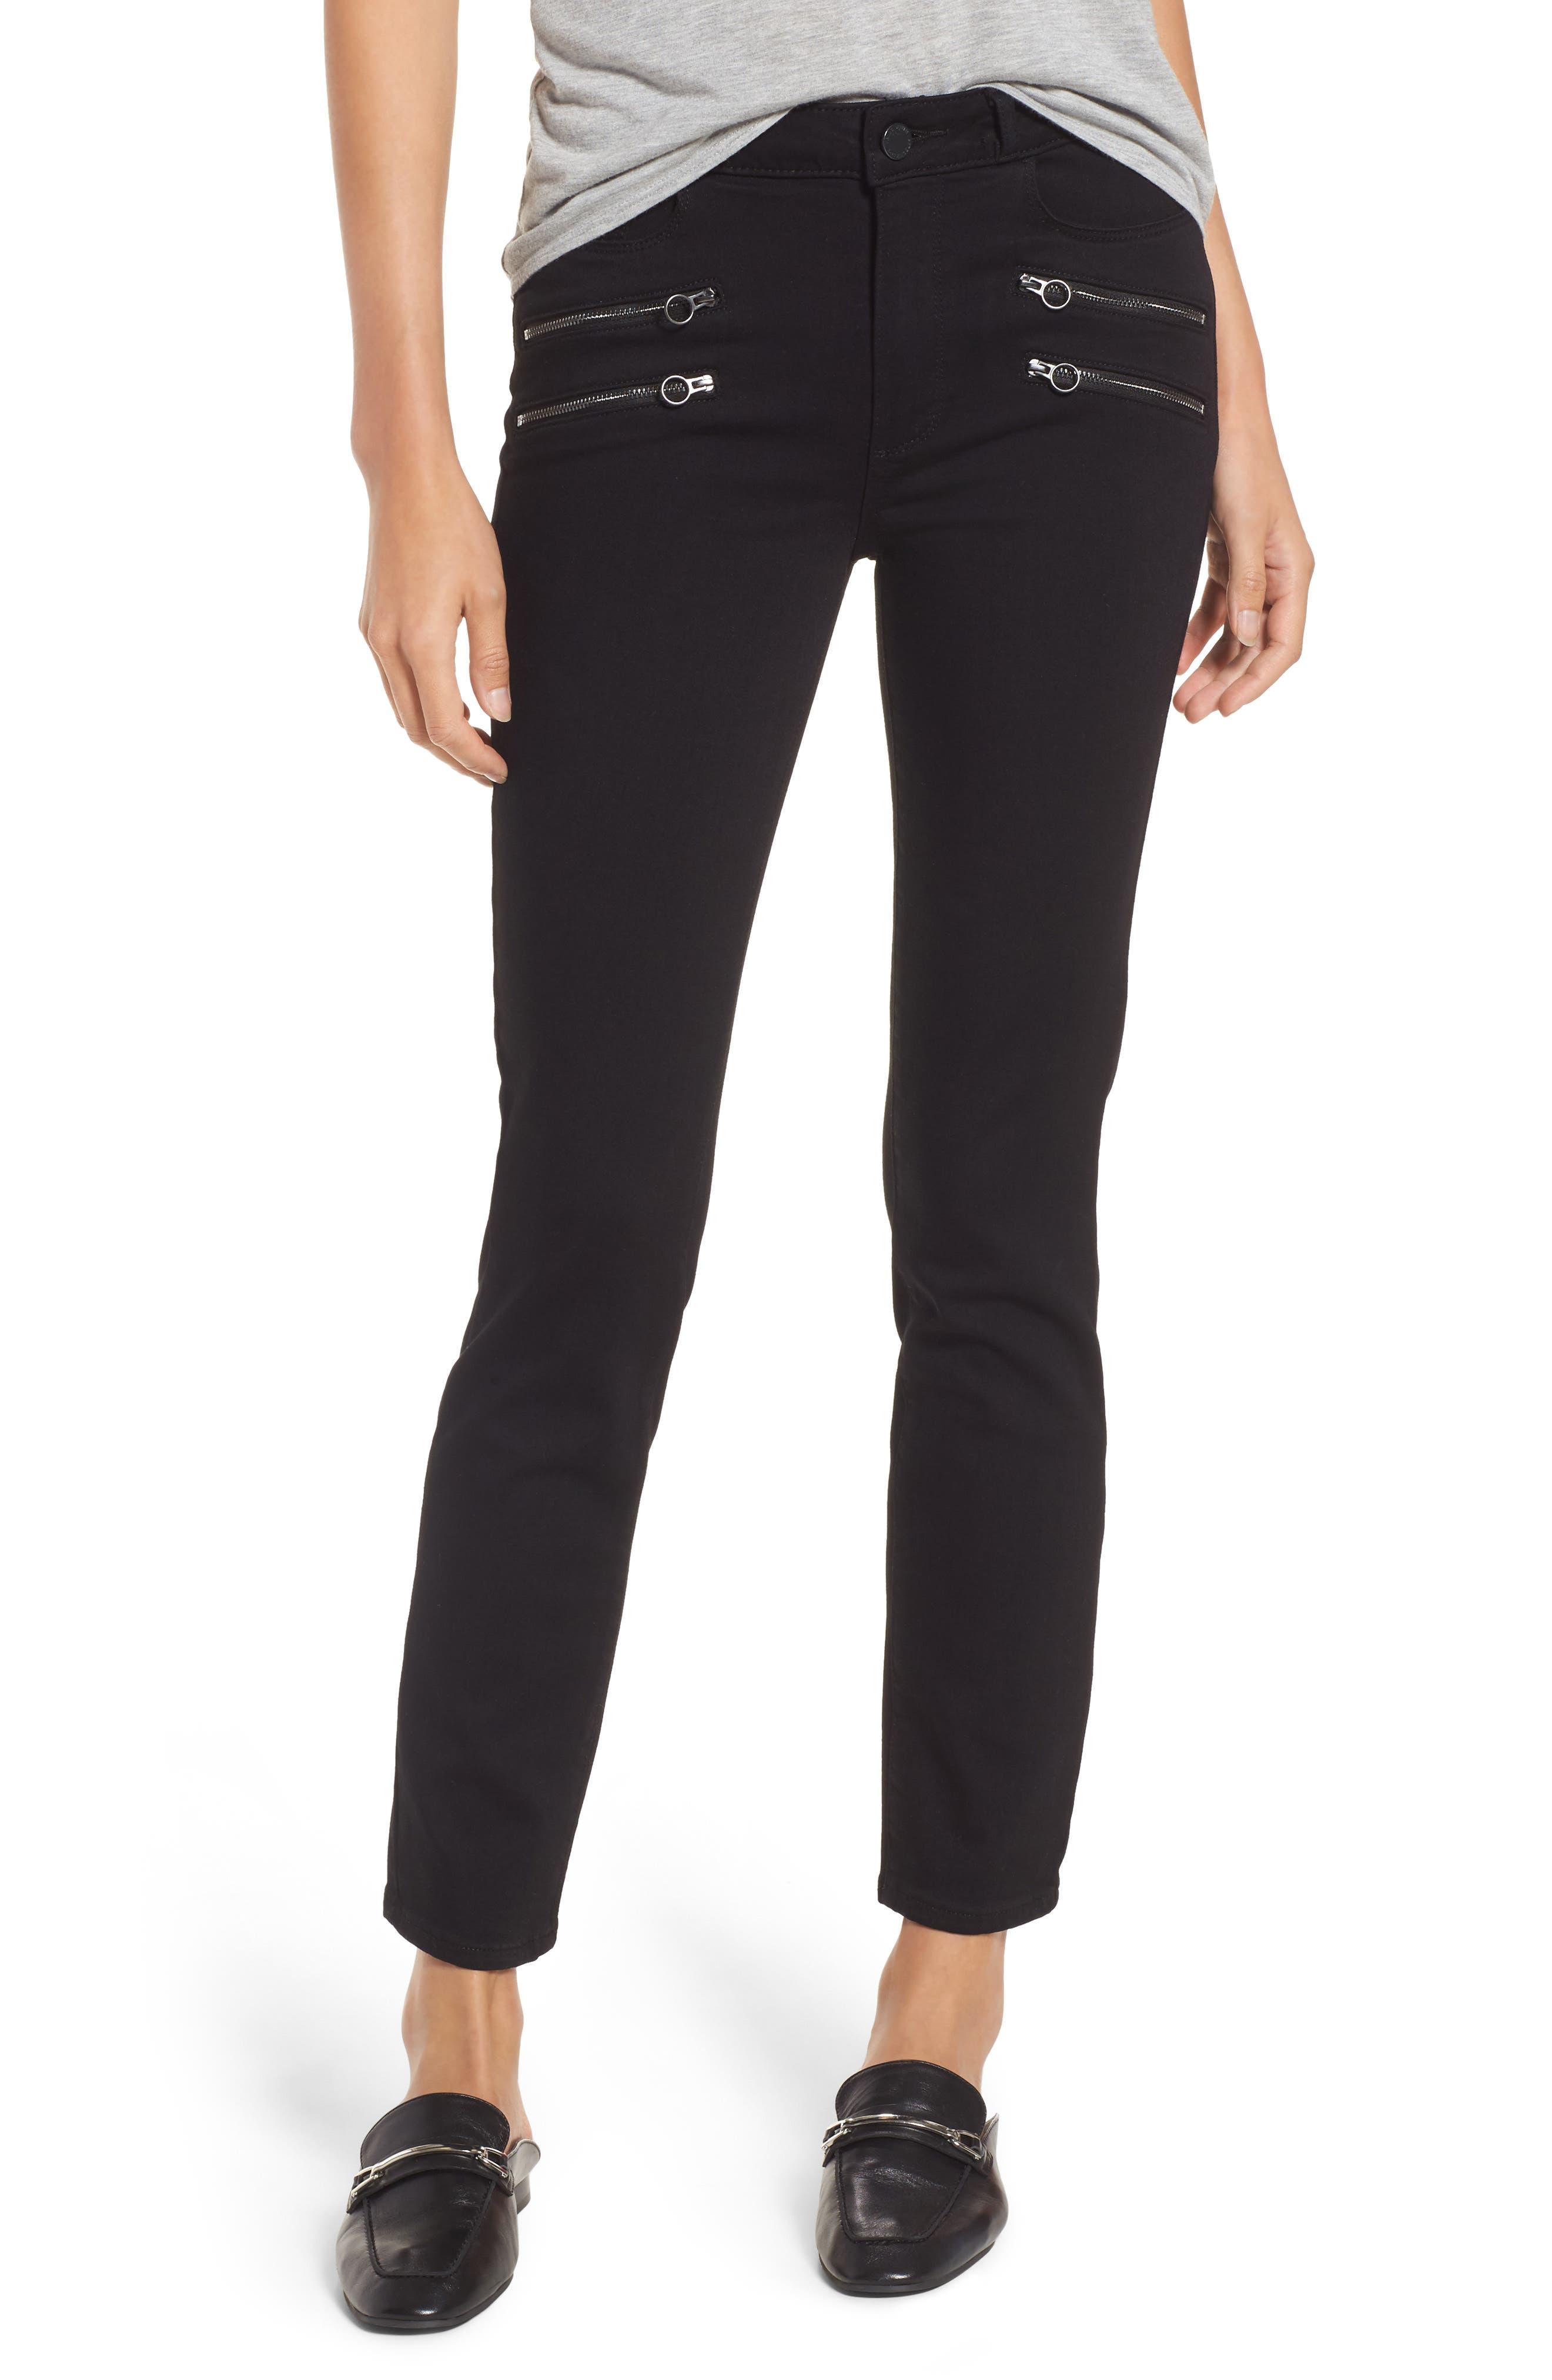 Alternate Image 1 Selected - PAIGE Transcend - Kylo High Waist Skinny Jeans (Black Shadow)